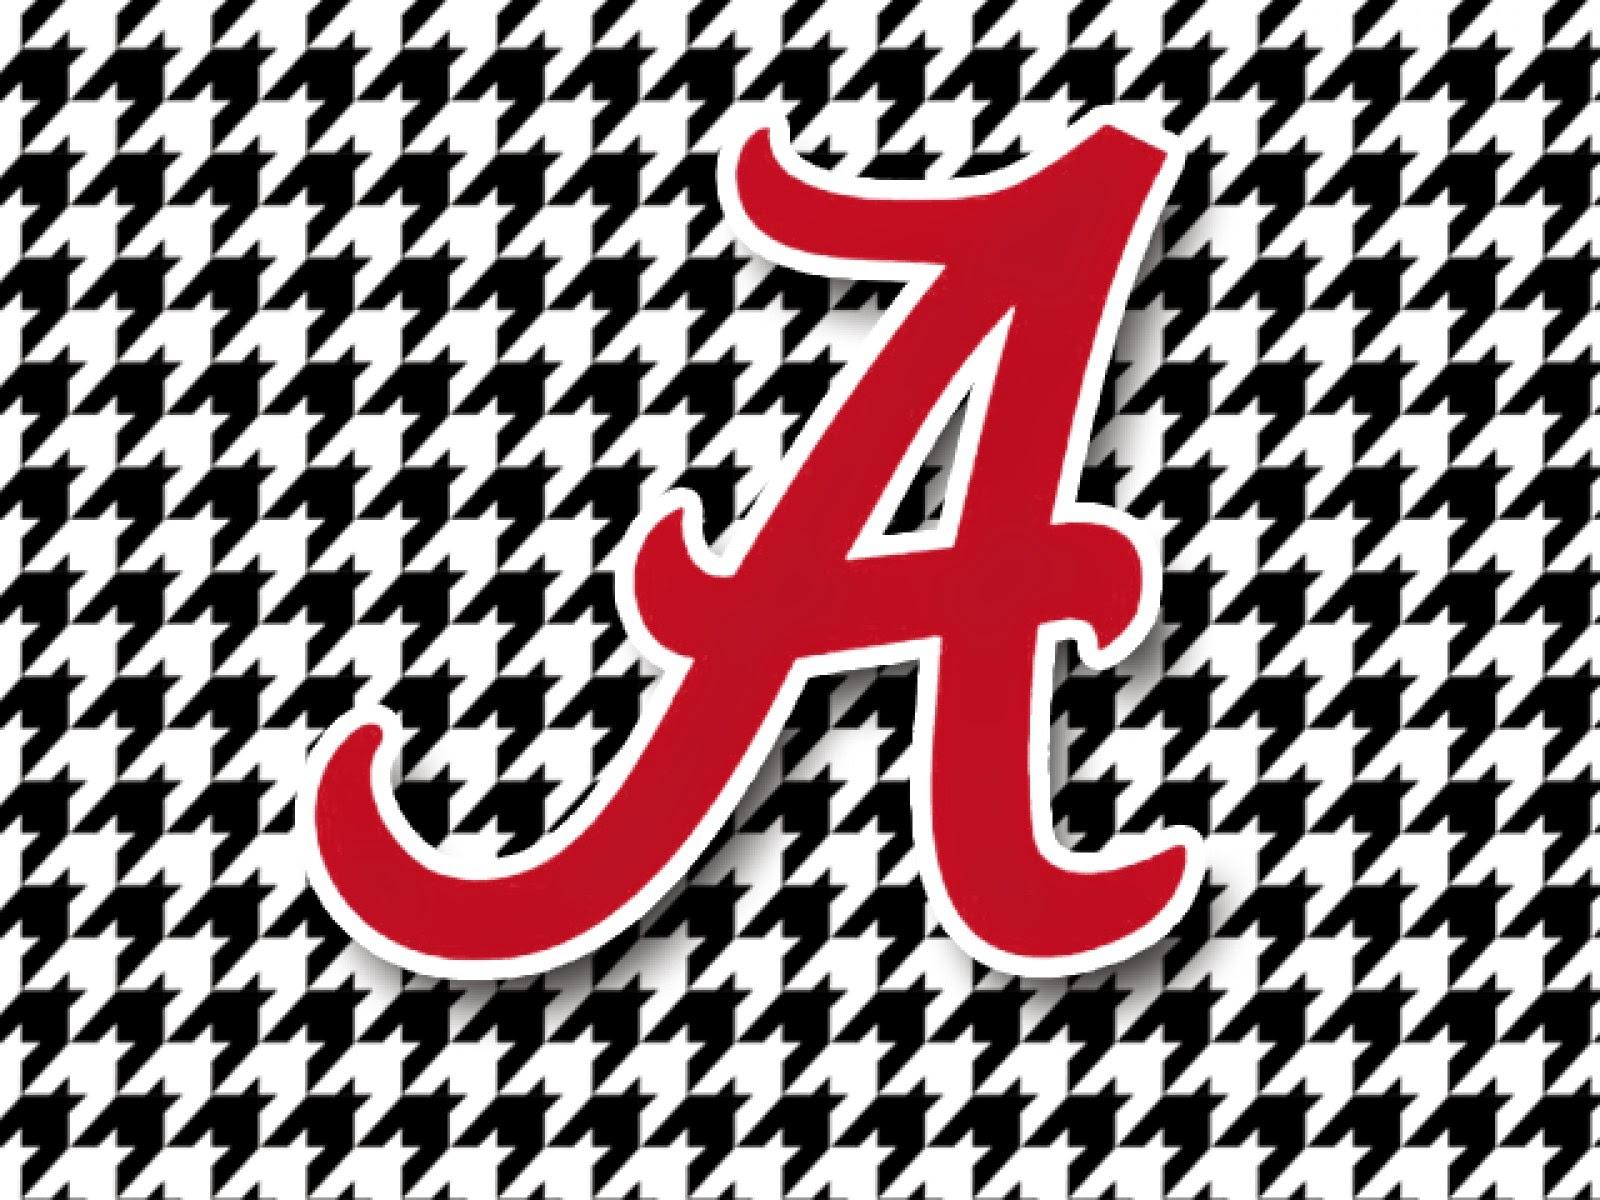 University of Alabama Football Schedule 2013 University of Alabama Football